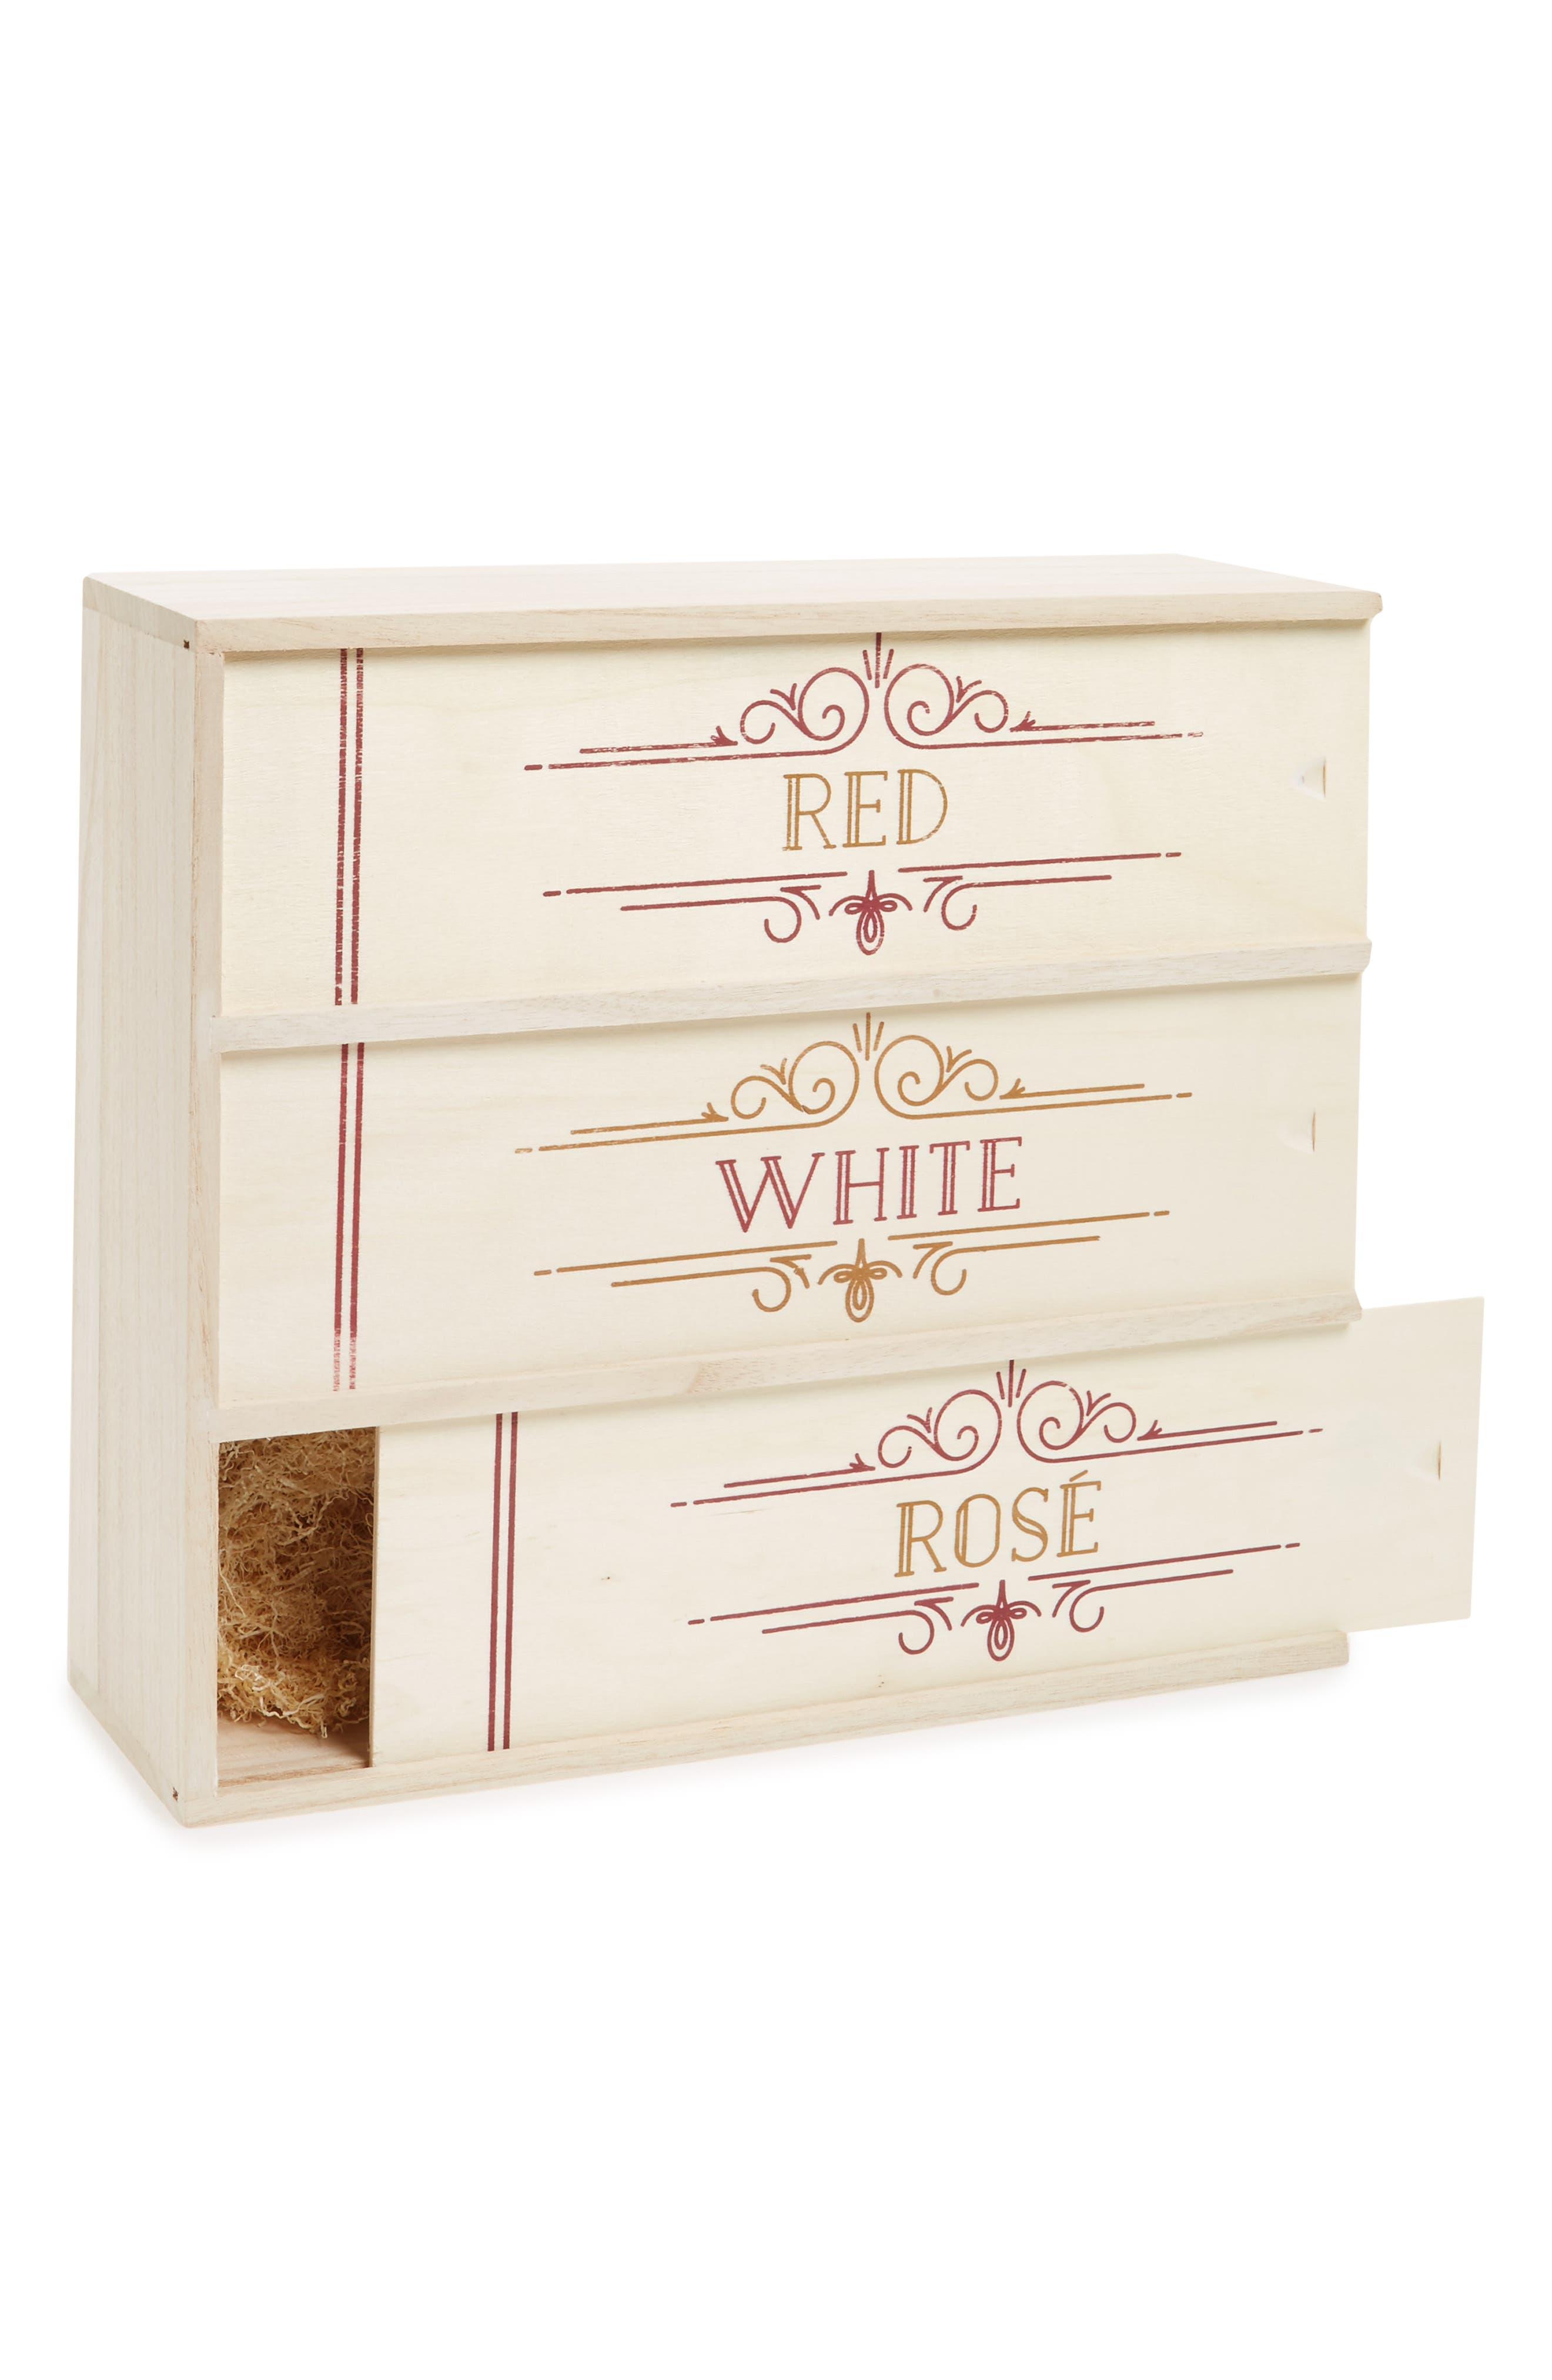 Red, White & Rosé Wine Box,                             Main thumbnail 1, color,                             Beige